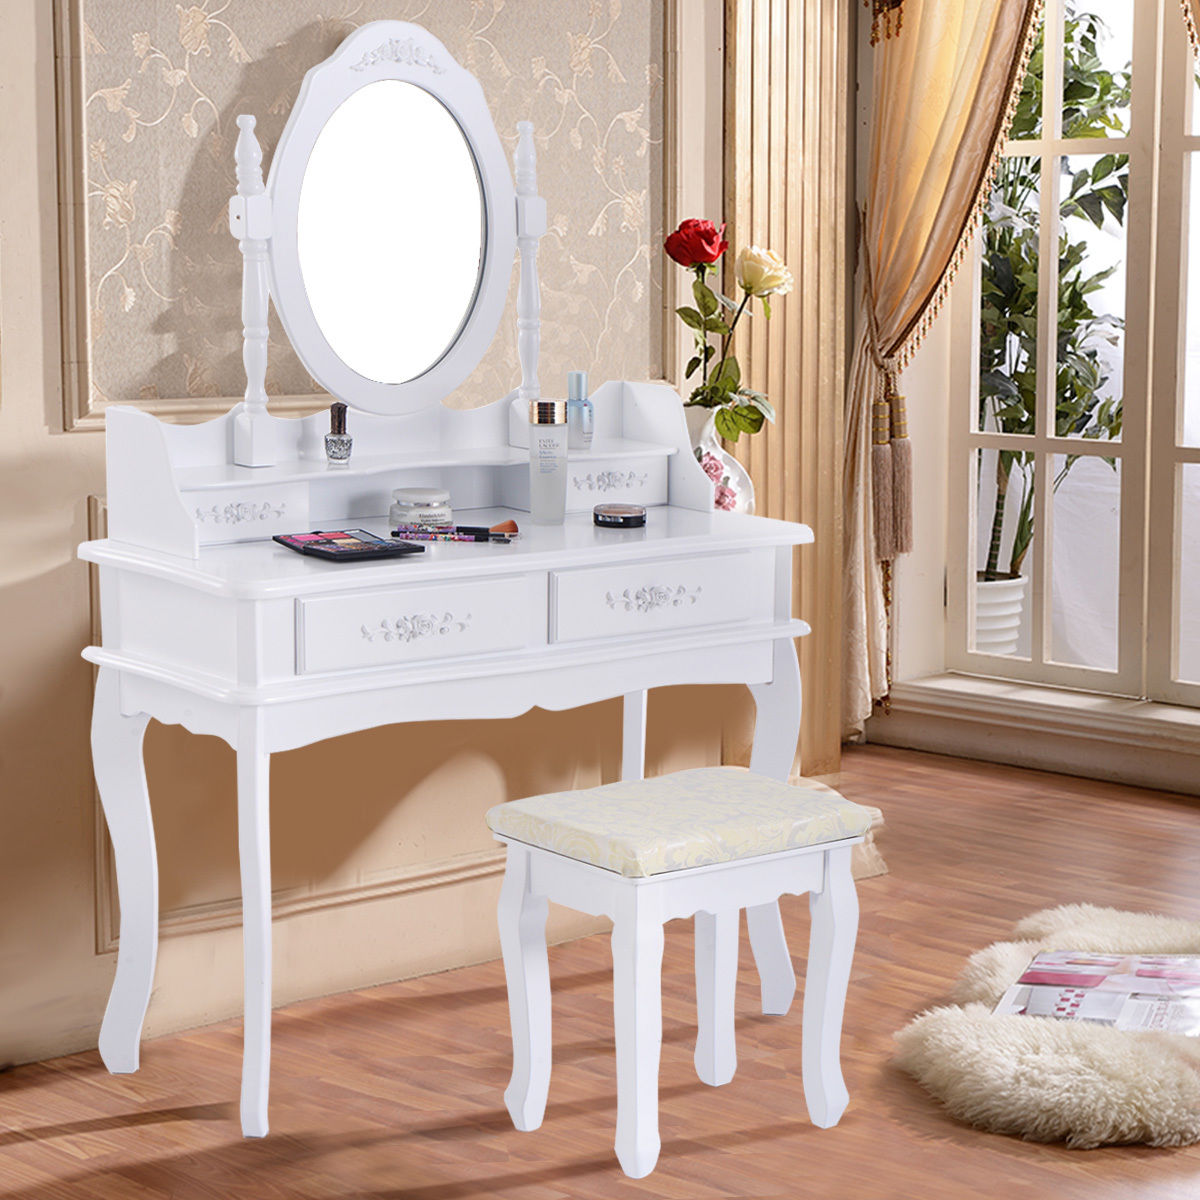 costway white vanity jewelry makeup dressing table set bathroom w/stool 4 MPQHEFX